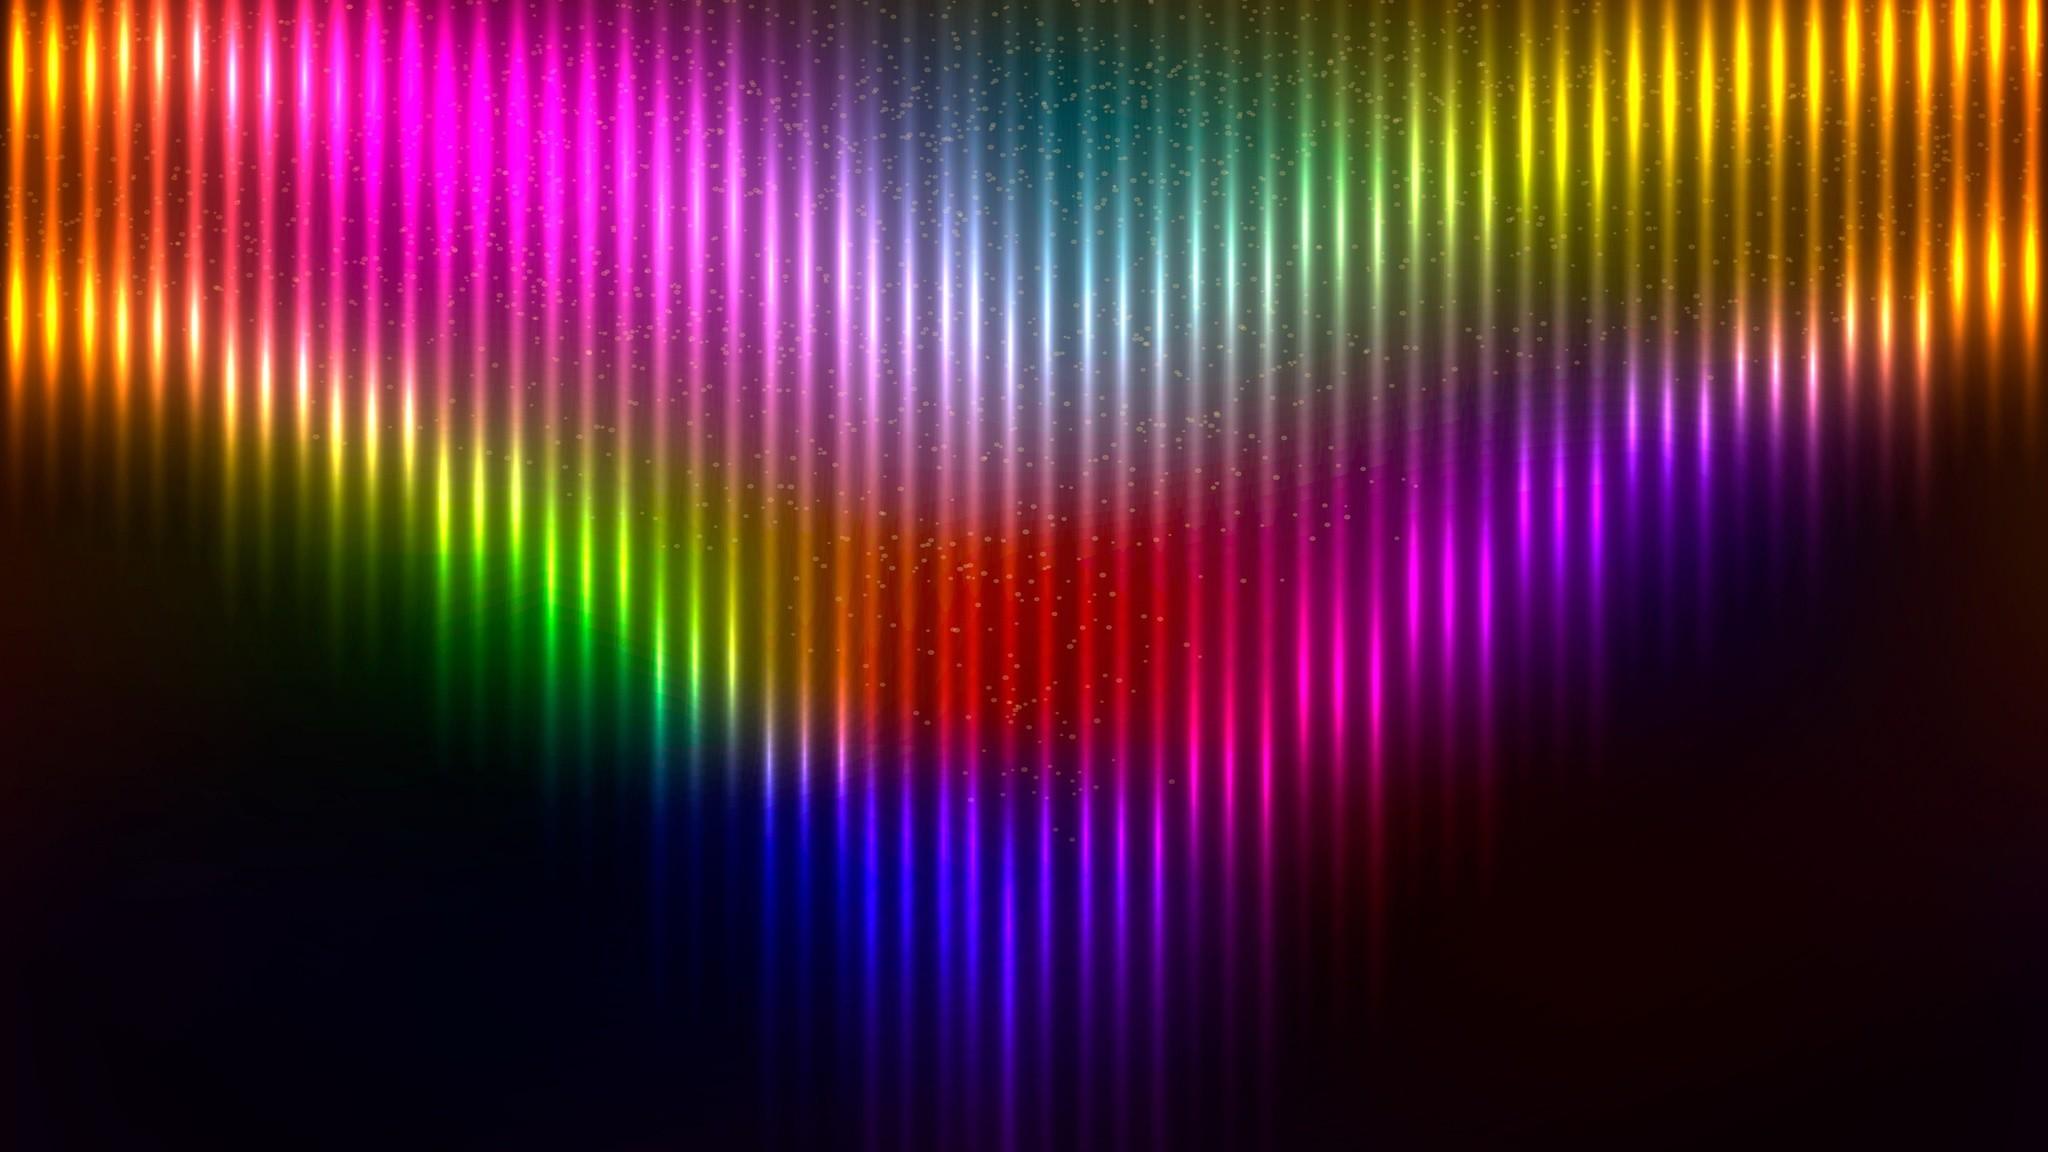 Res: 2048x1152, artistic-colors-rainbow-background-4k-z8.jpg